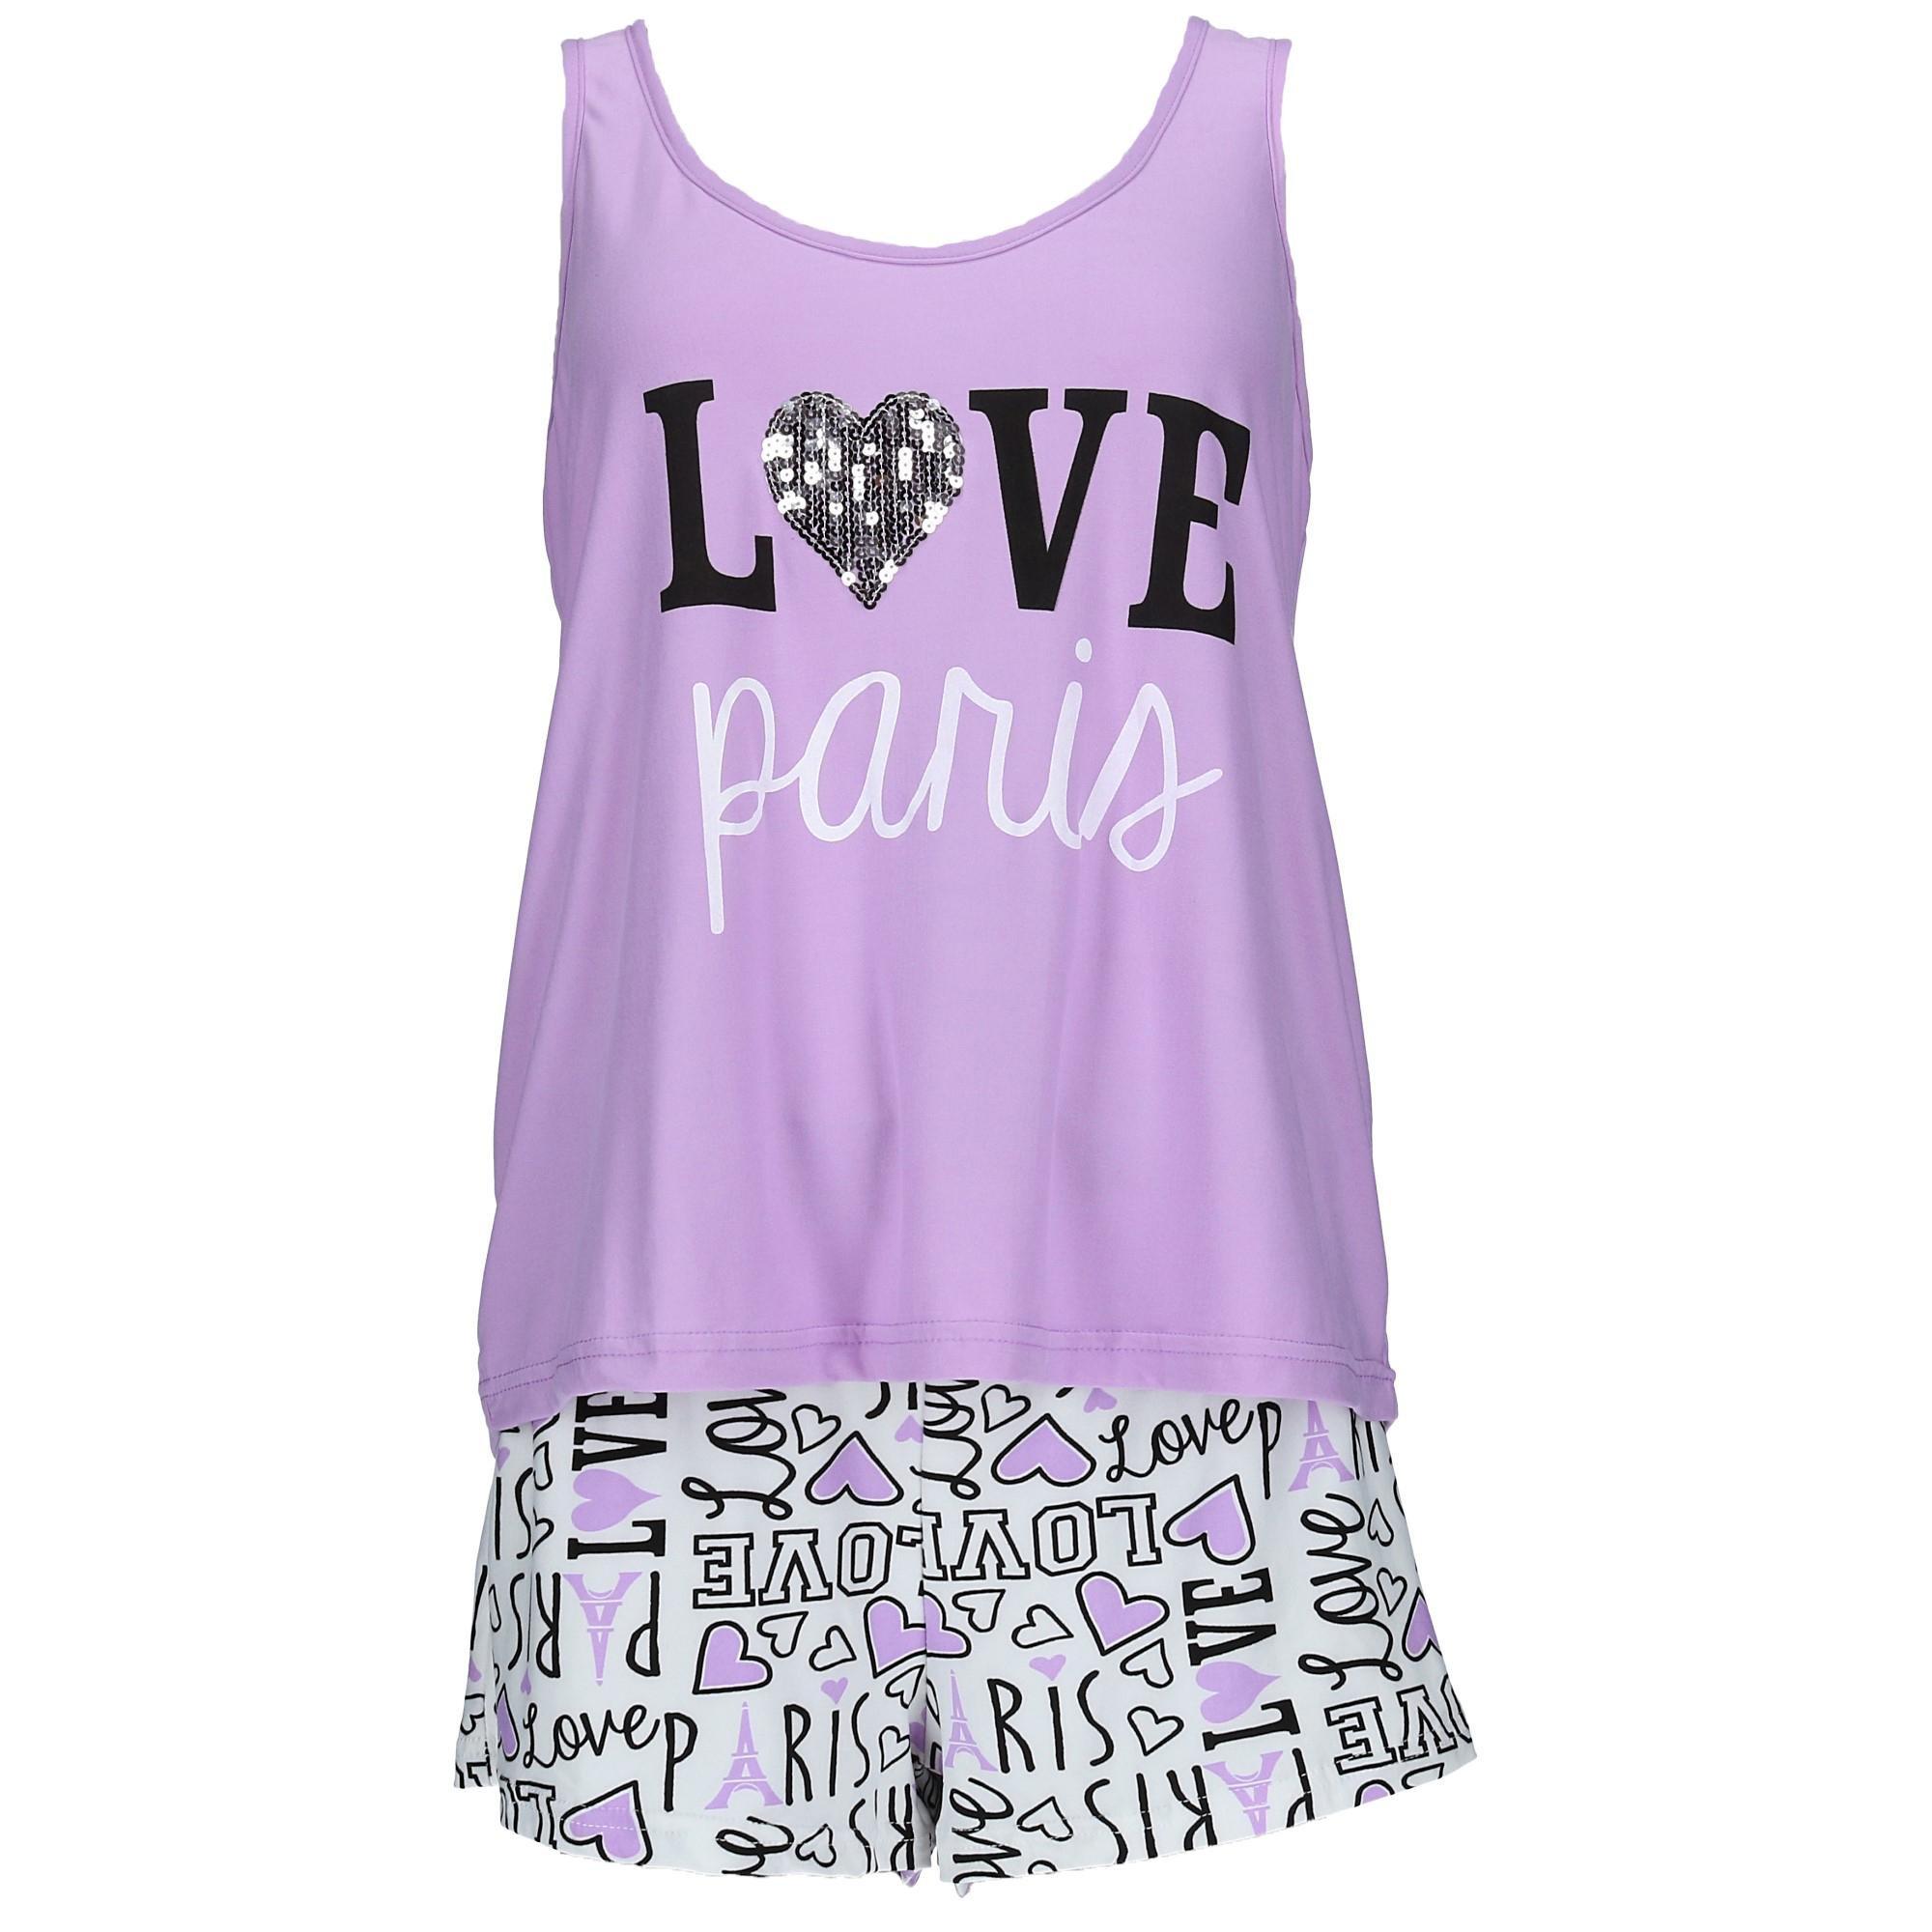 em & alfie Women's Plus Size Tank and Short Pajama Set, 2X, Purple